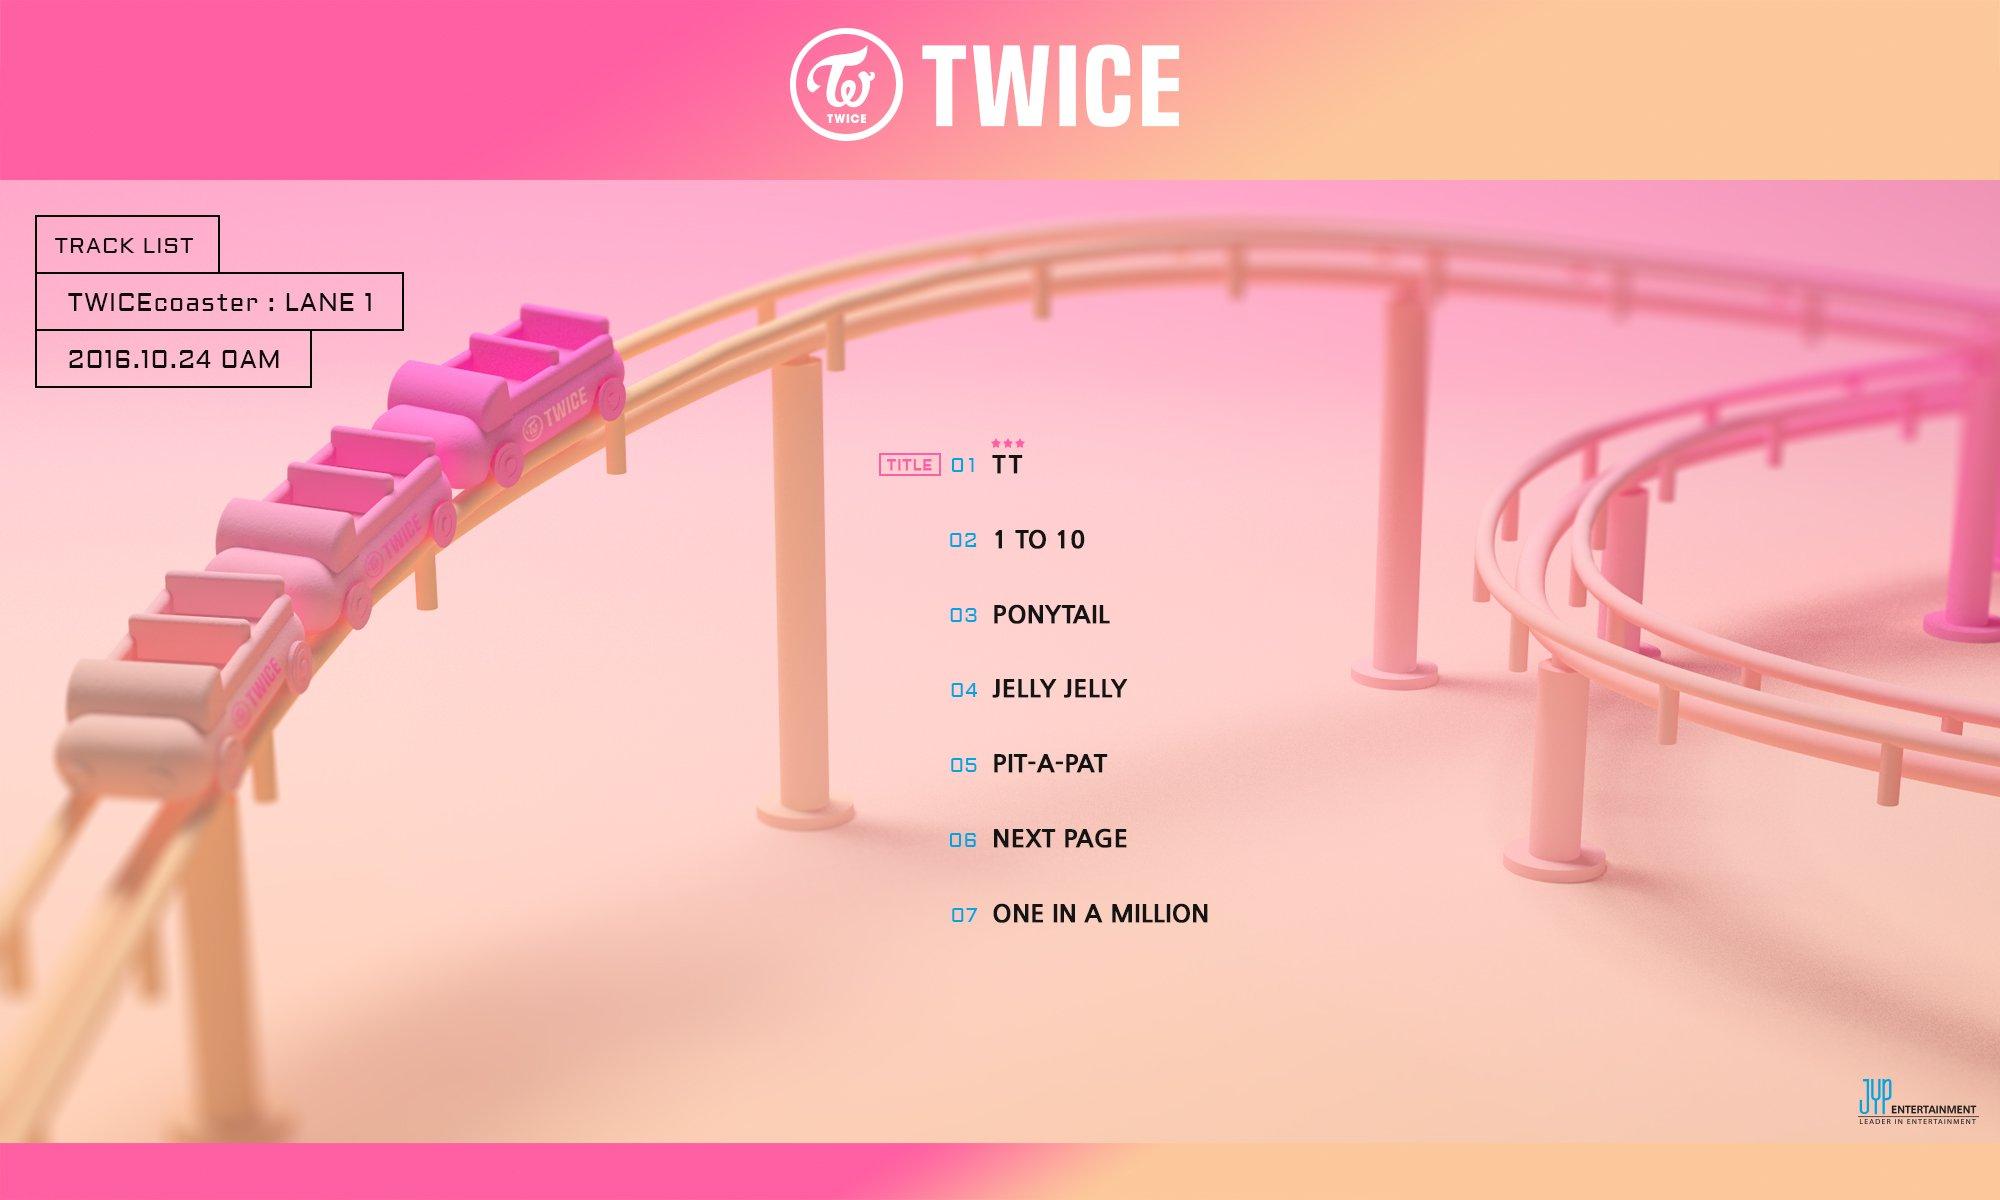 twice track list